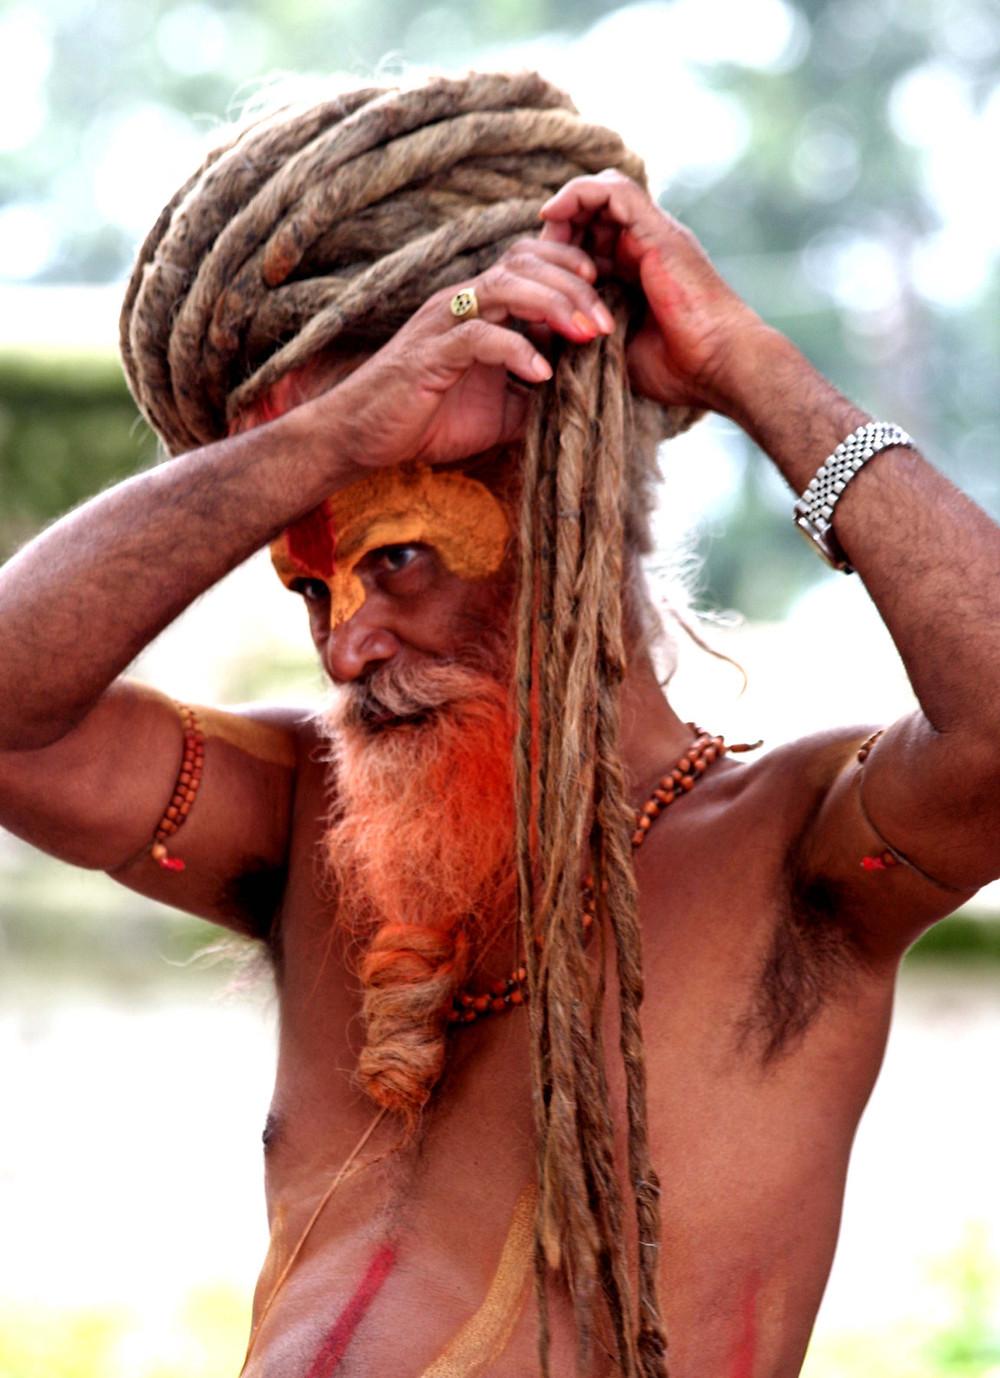 Sadhu che raccoglie i capelli (Pashupatinath – Nepal, agosto 2019)